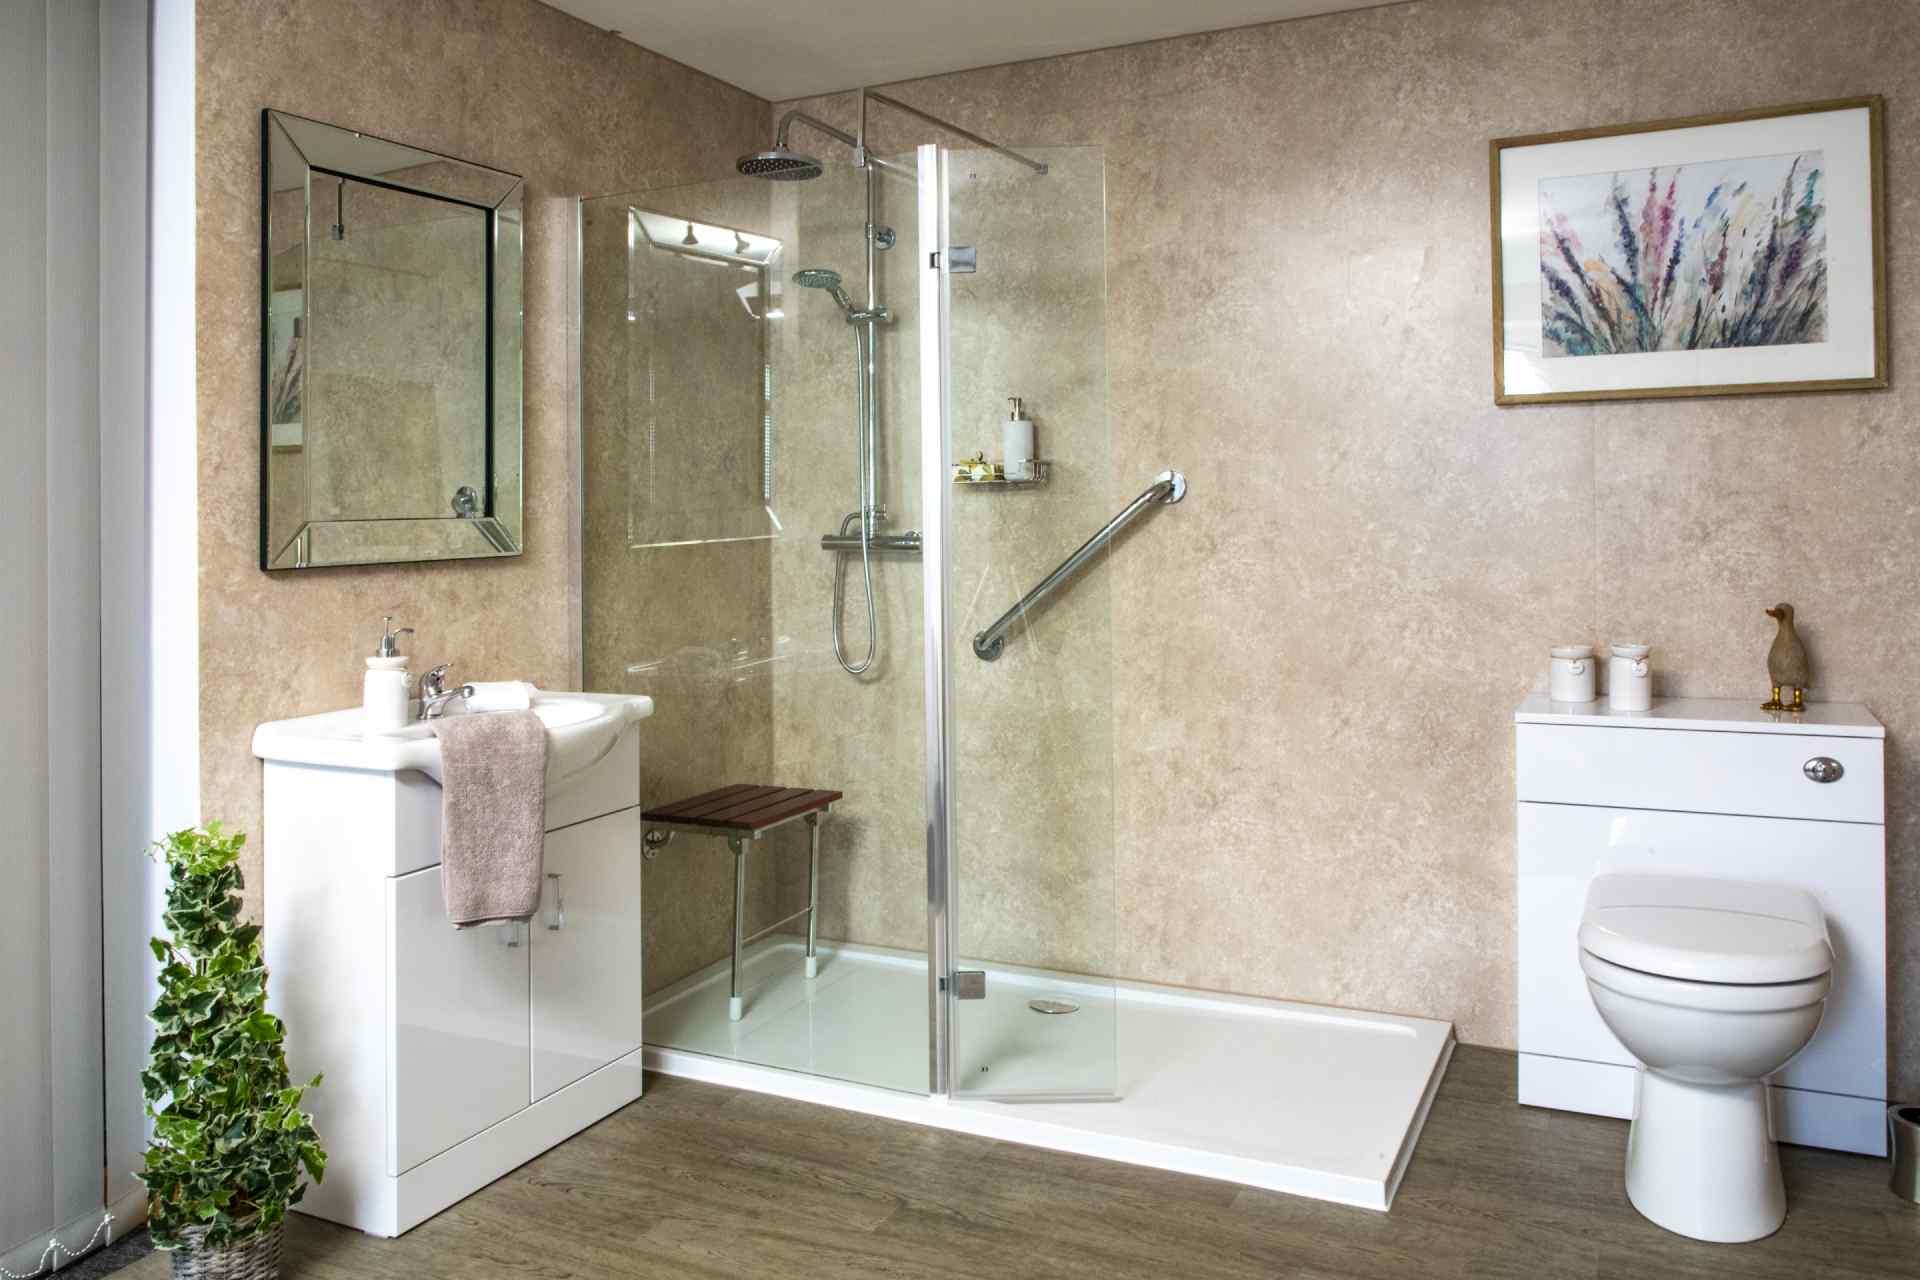 Bespoke Bathing Company Bathroom & Shower